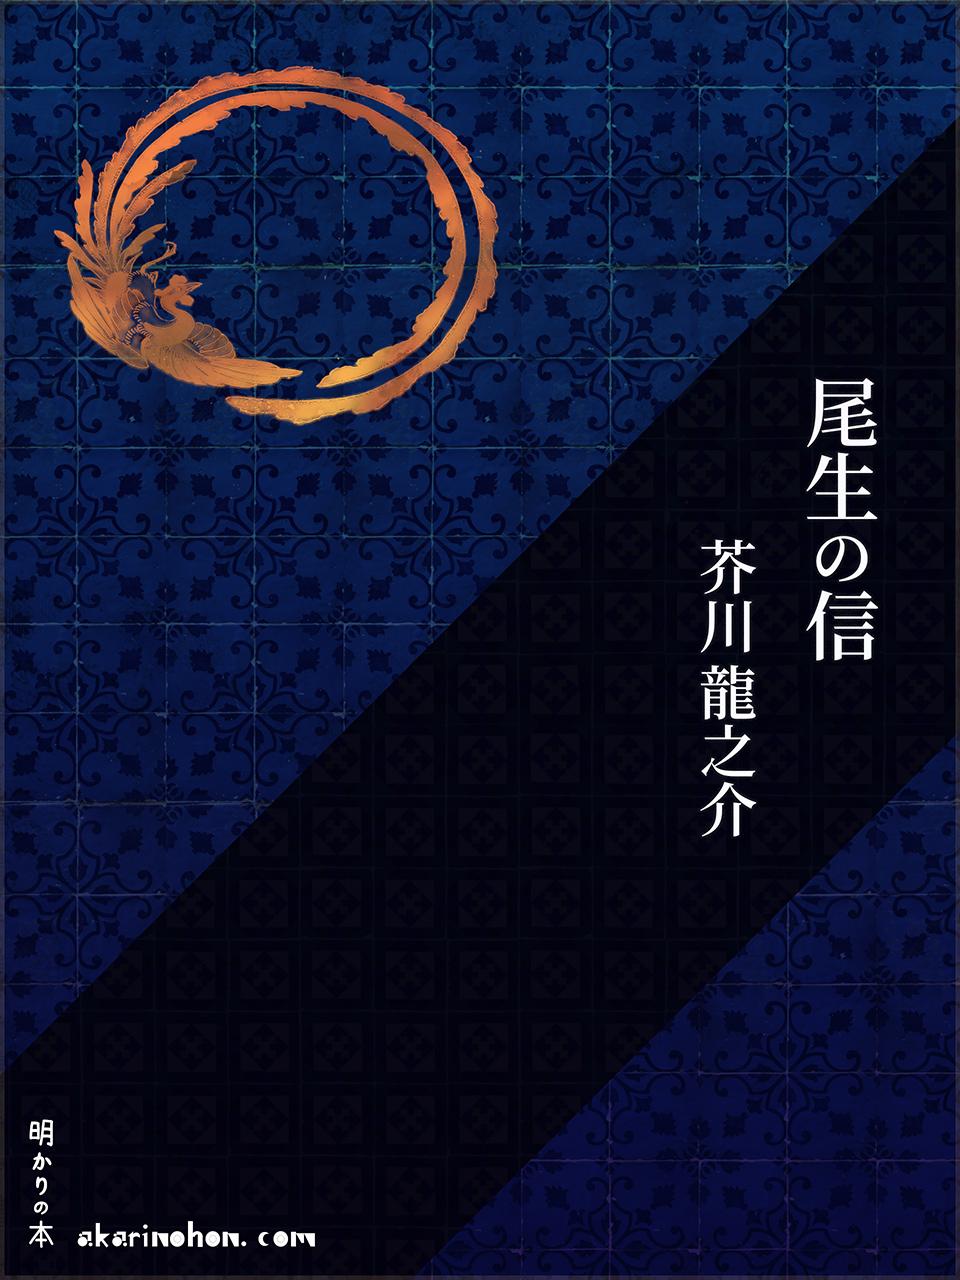 0000 - 尾生の信 芥川龍之介